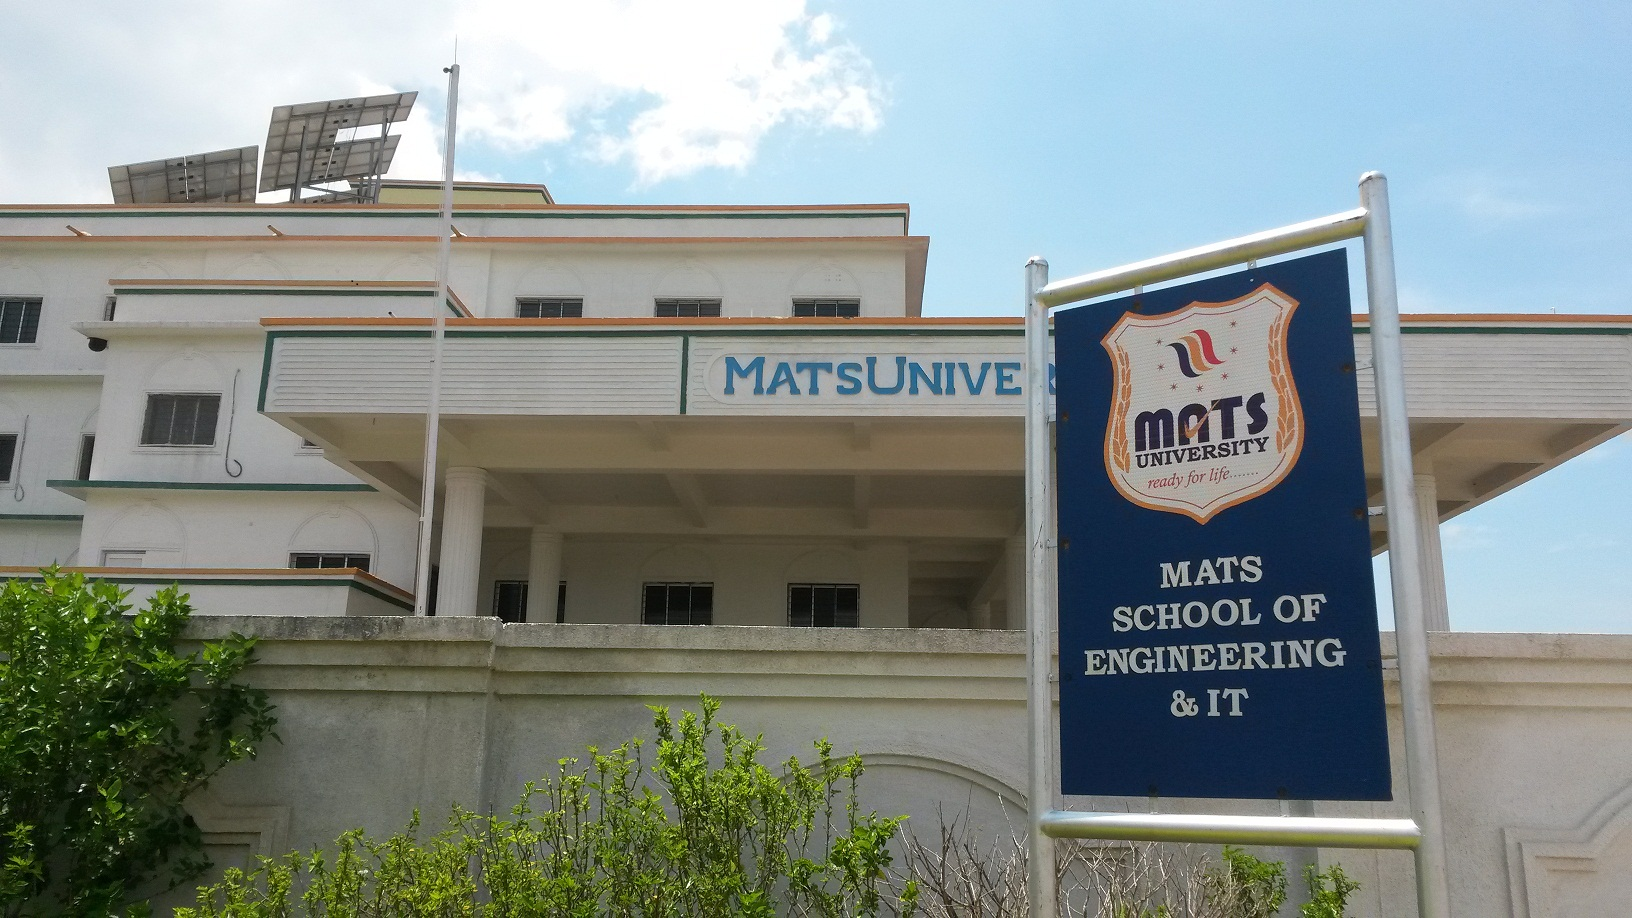 mats university distance education